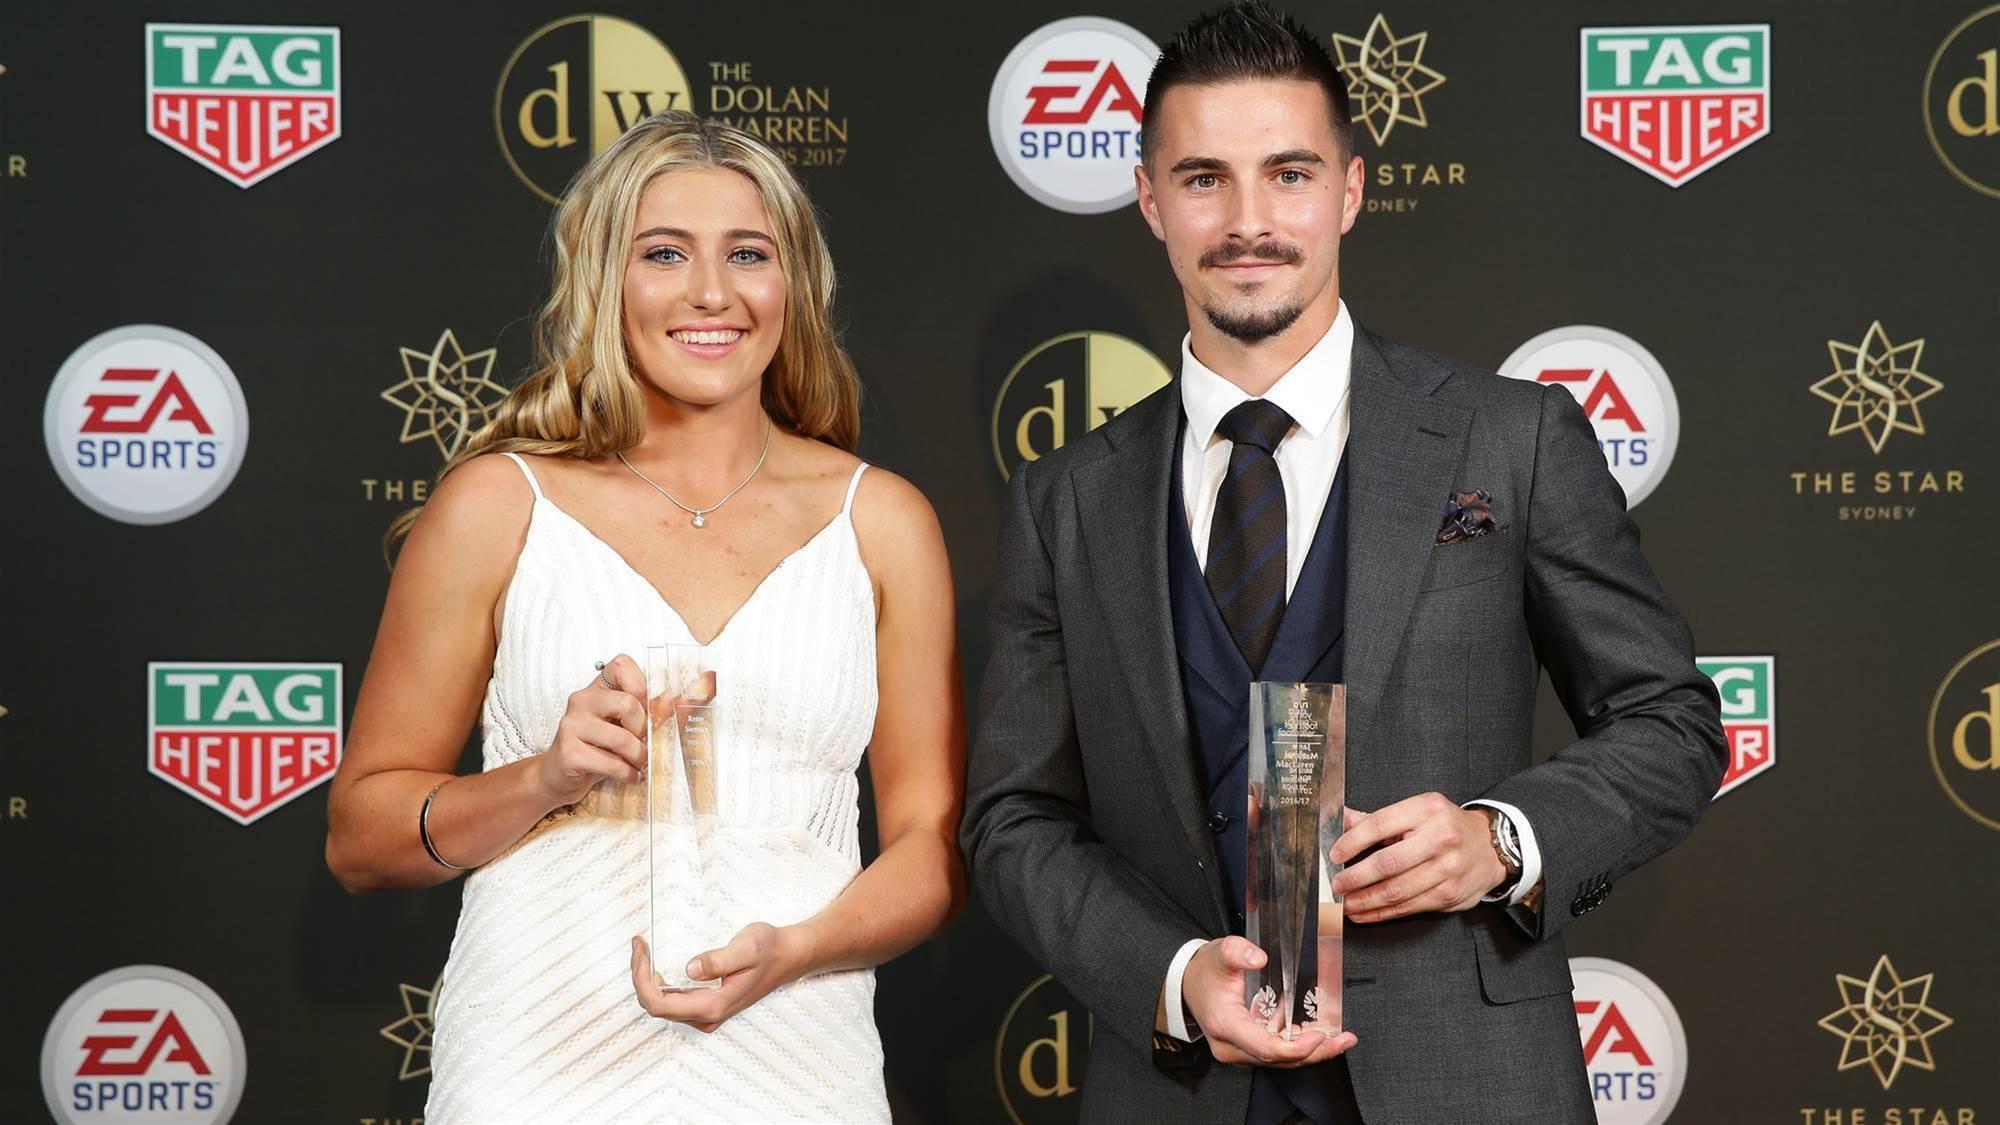 Maclaren, Siemsen named Young Footballers of the Year